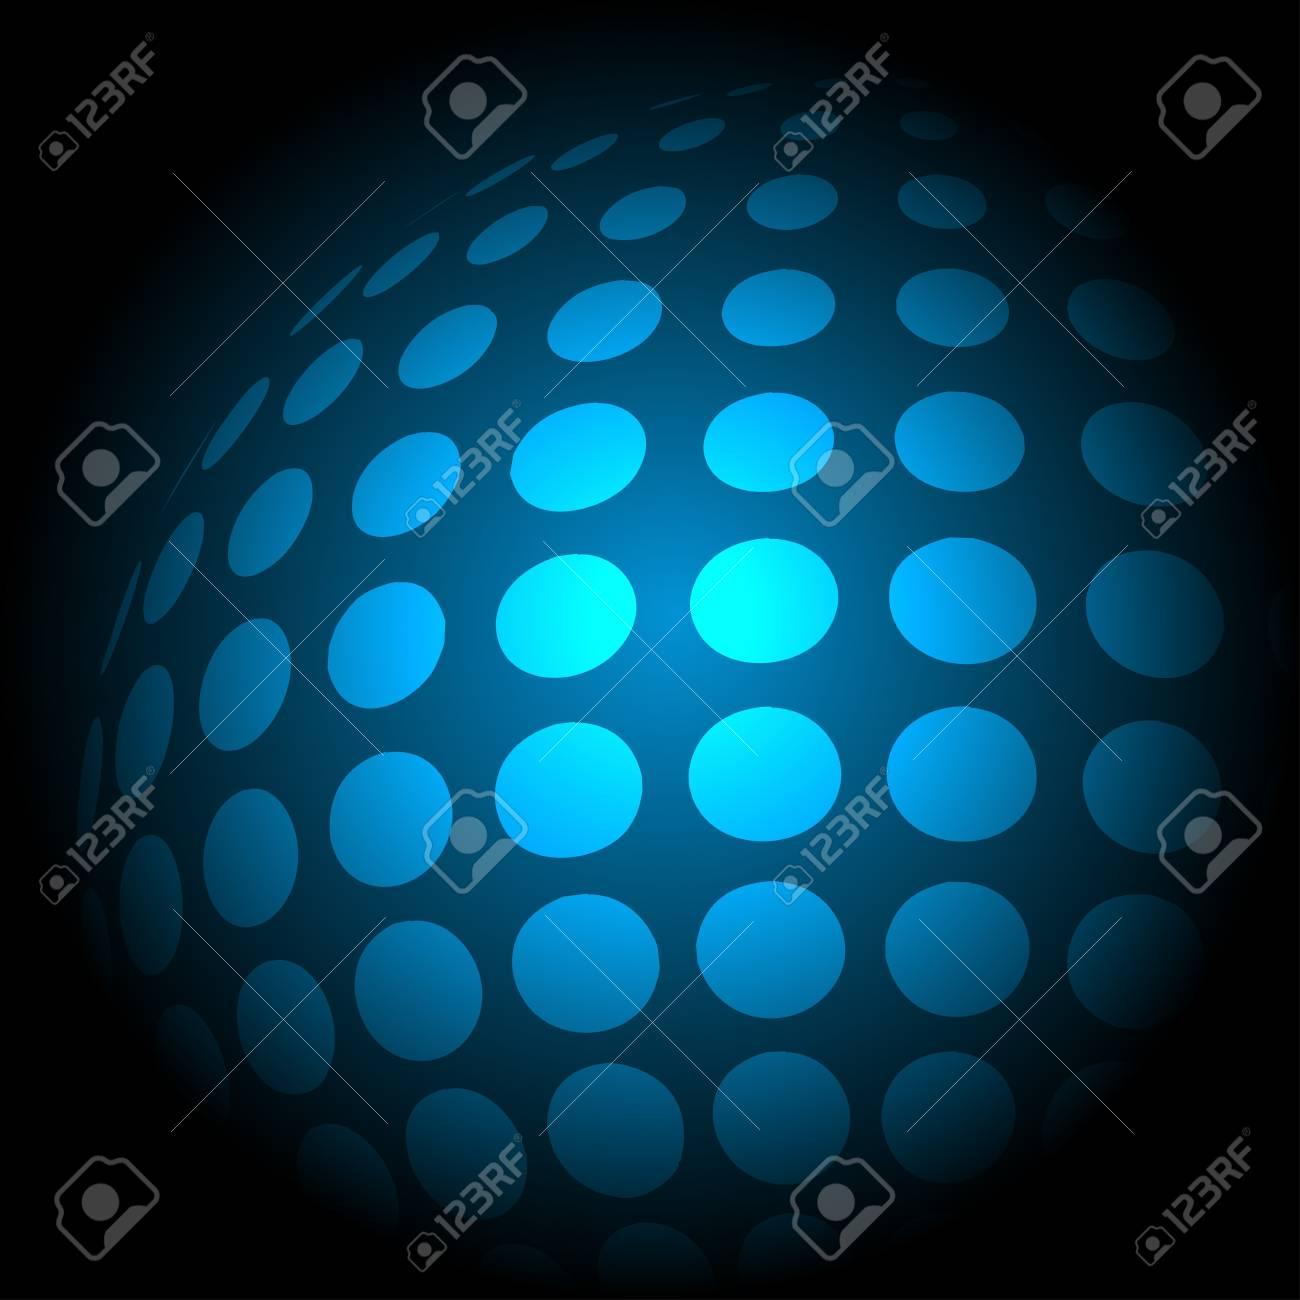 blue technology background, vector illustration eps10 Stock Vector - 14152869